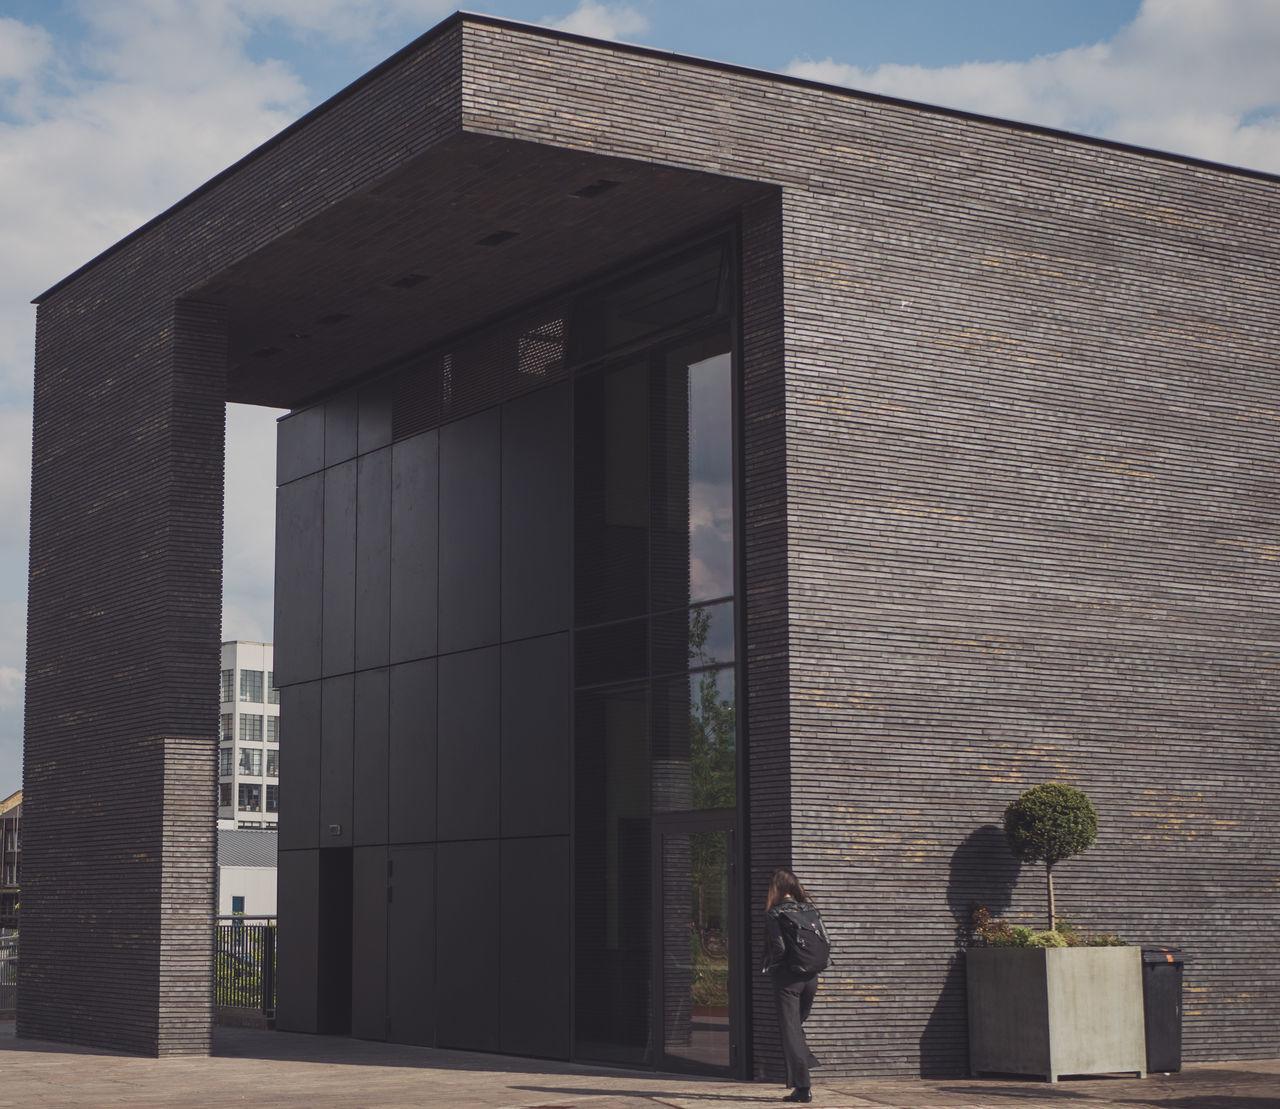 Beautiful stock photos of dunkel, architecture, built structure, building exterior, sunlight